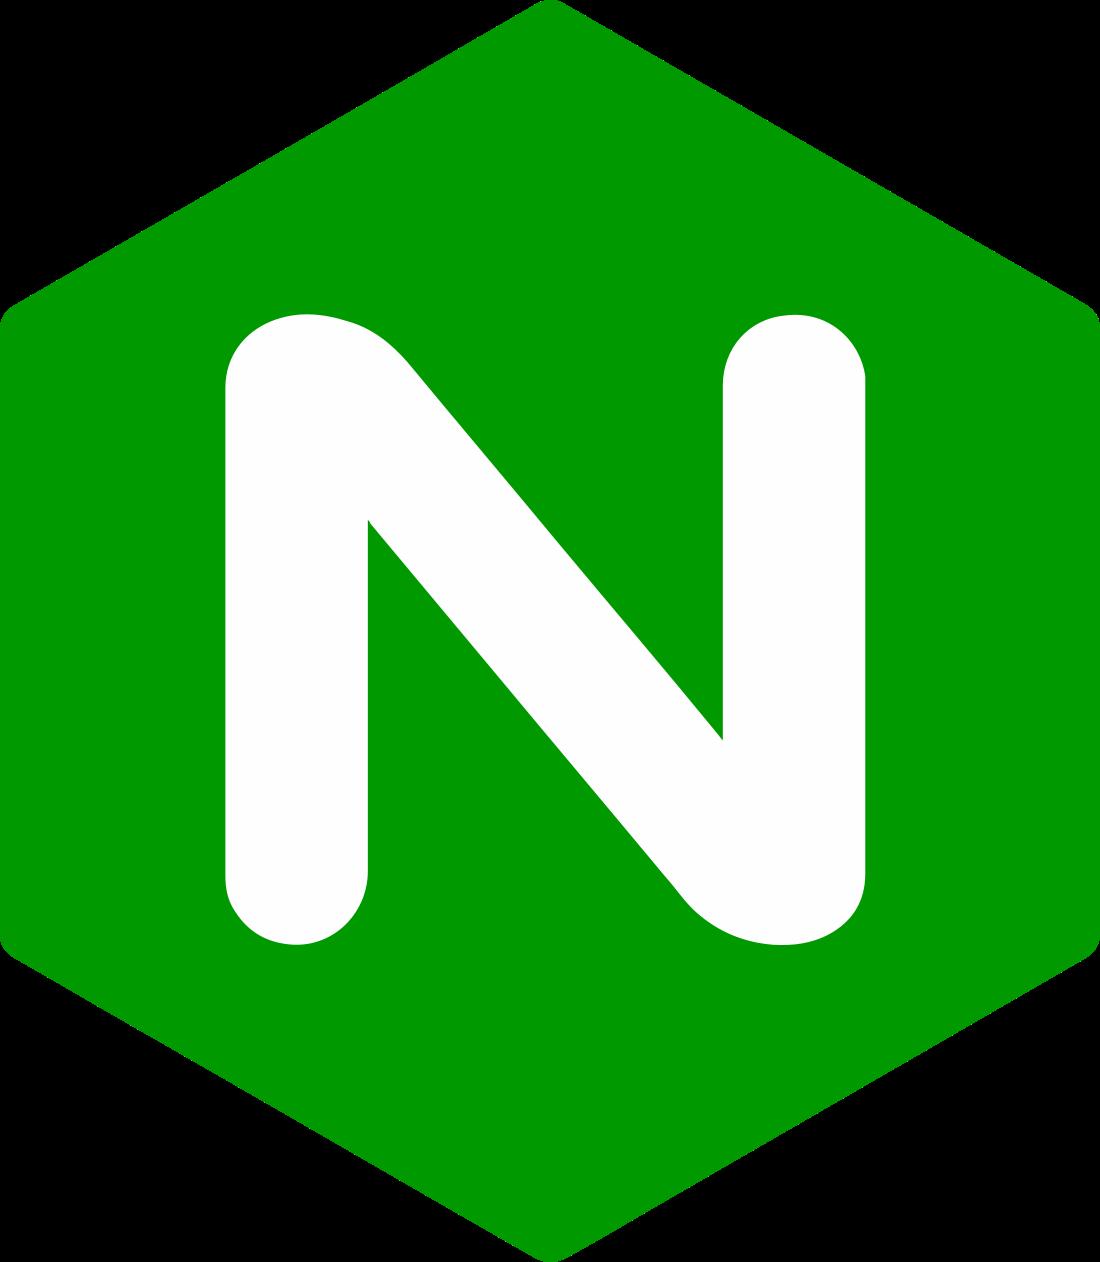 nginx-logo-7